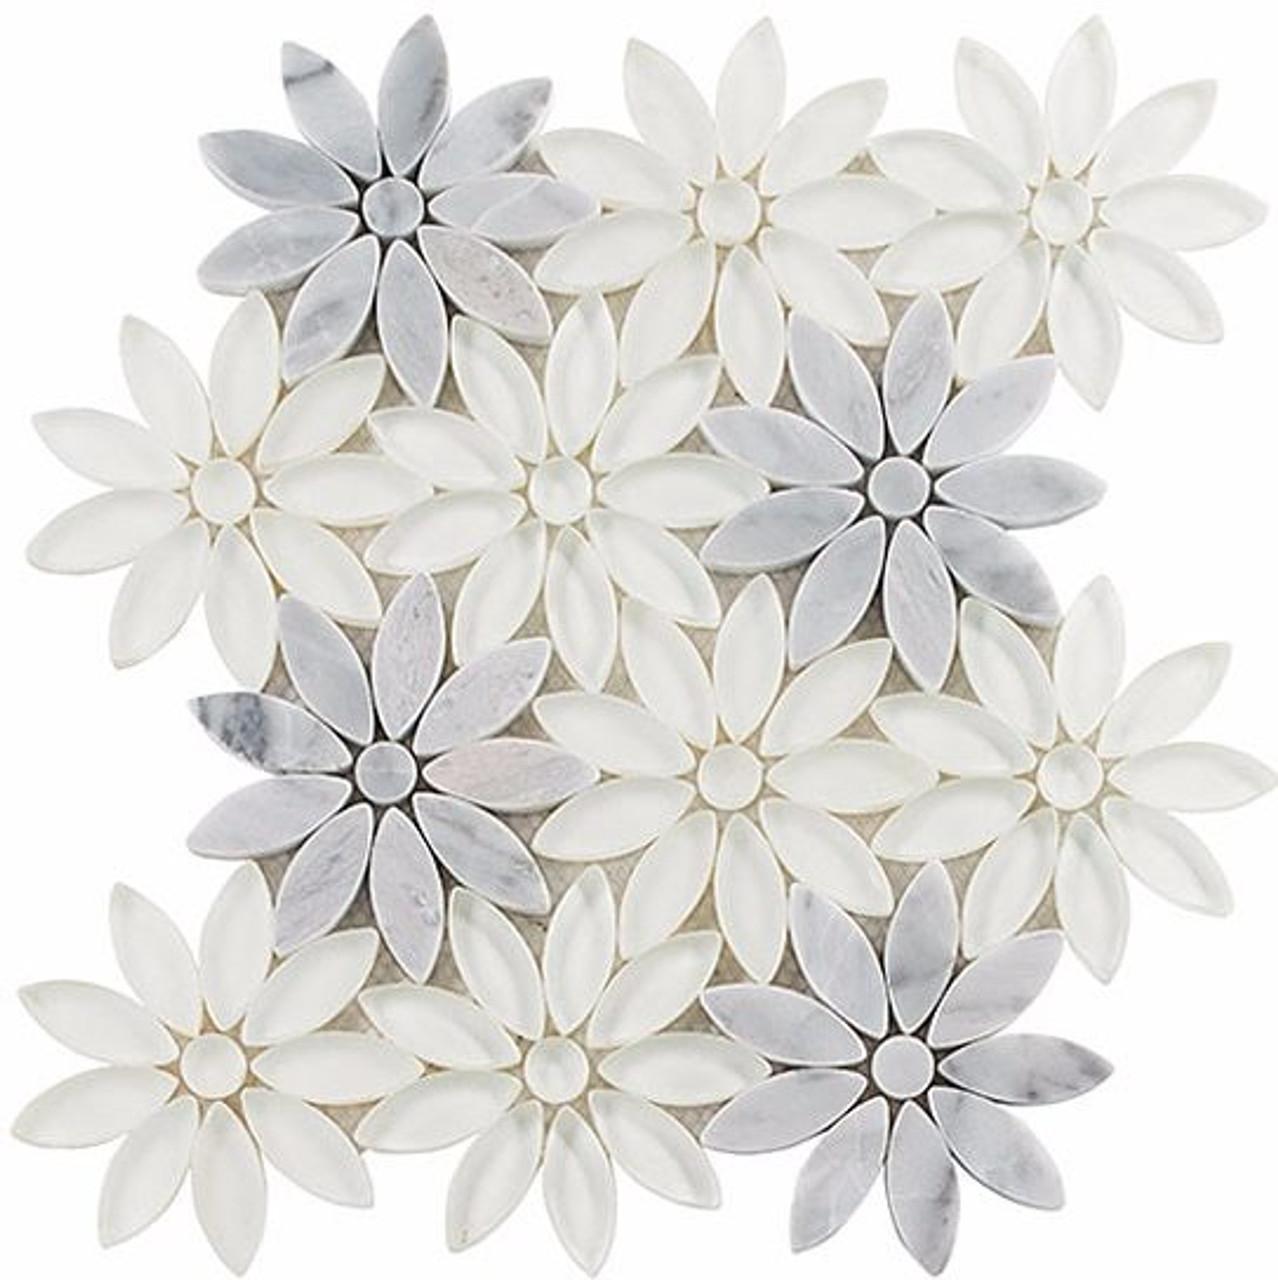 Bella Glass Tiles Bouquette Series Daisy Field